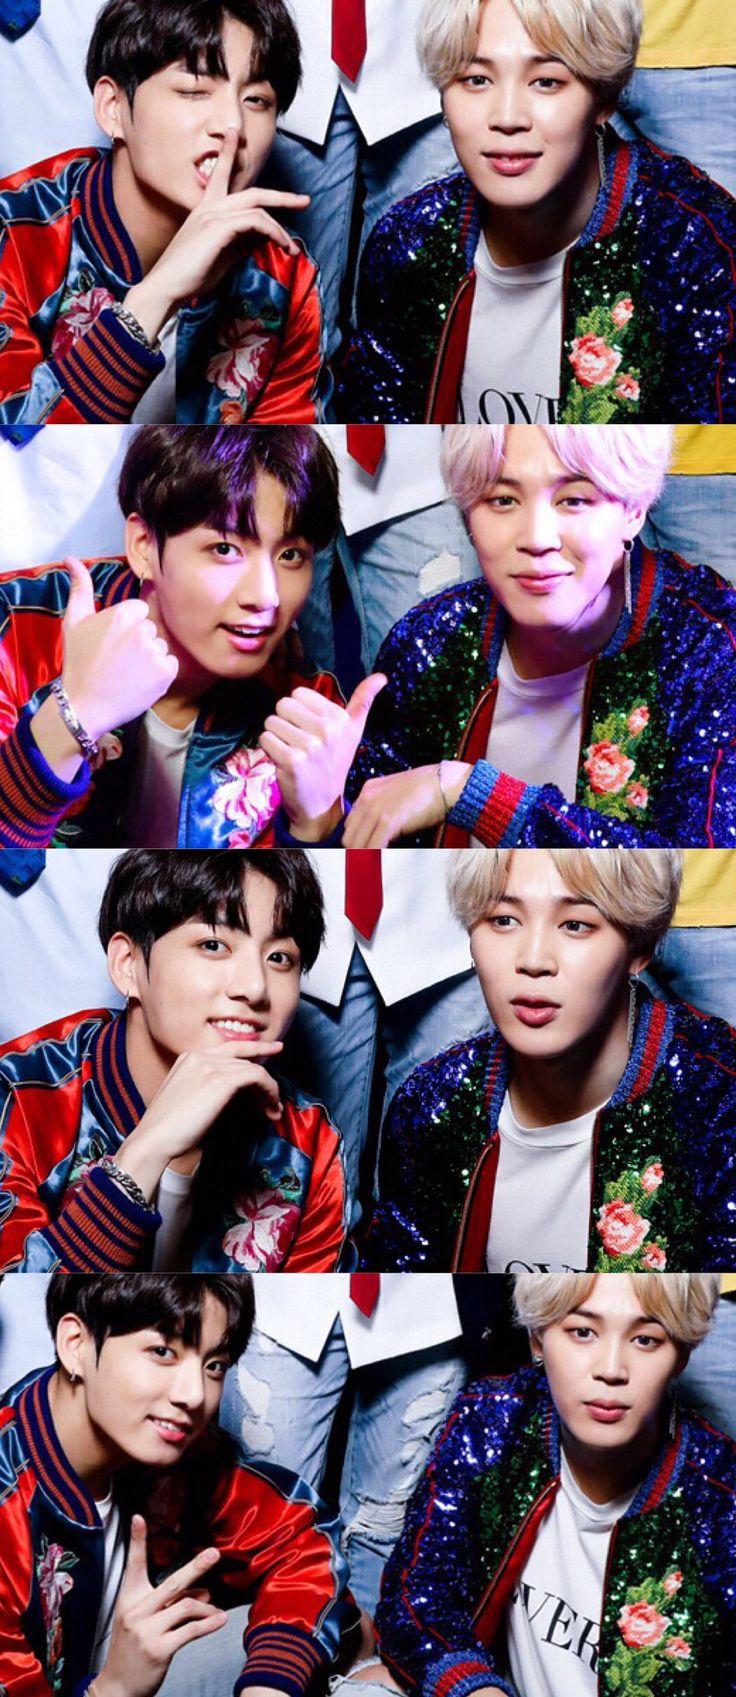 ☆〜JUNGKOOK x JIMIN // BTS at the 2017 American Music Awards Press Room at Microsoft Theater on November 19, 2017 in Los Angeles. ★彡